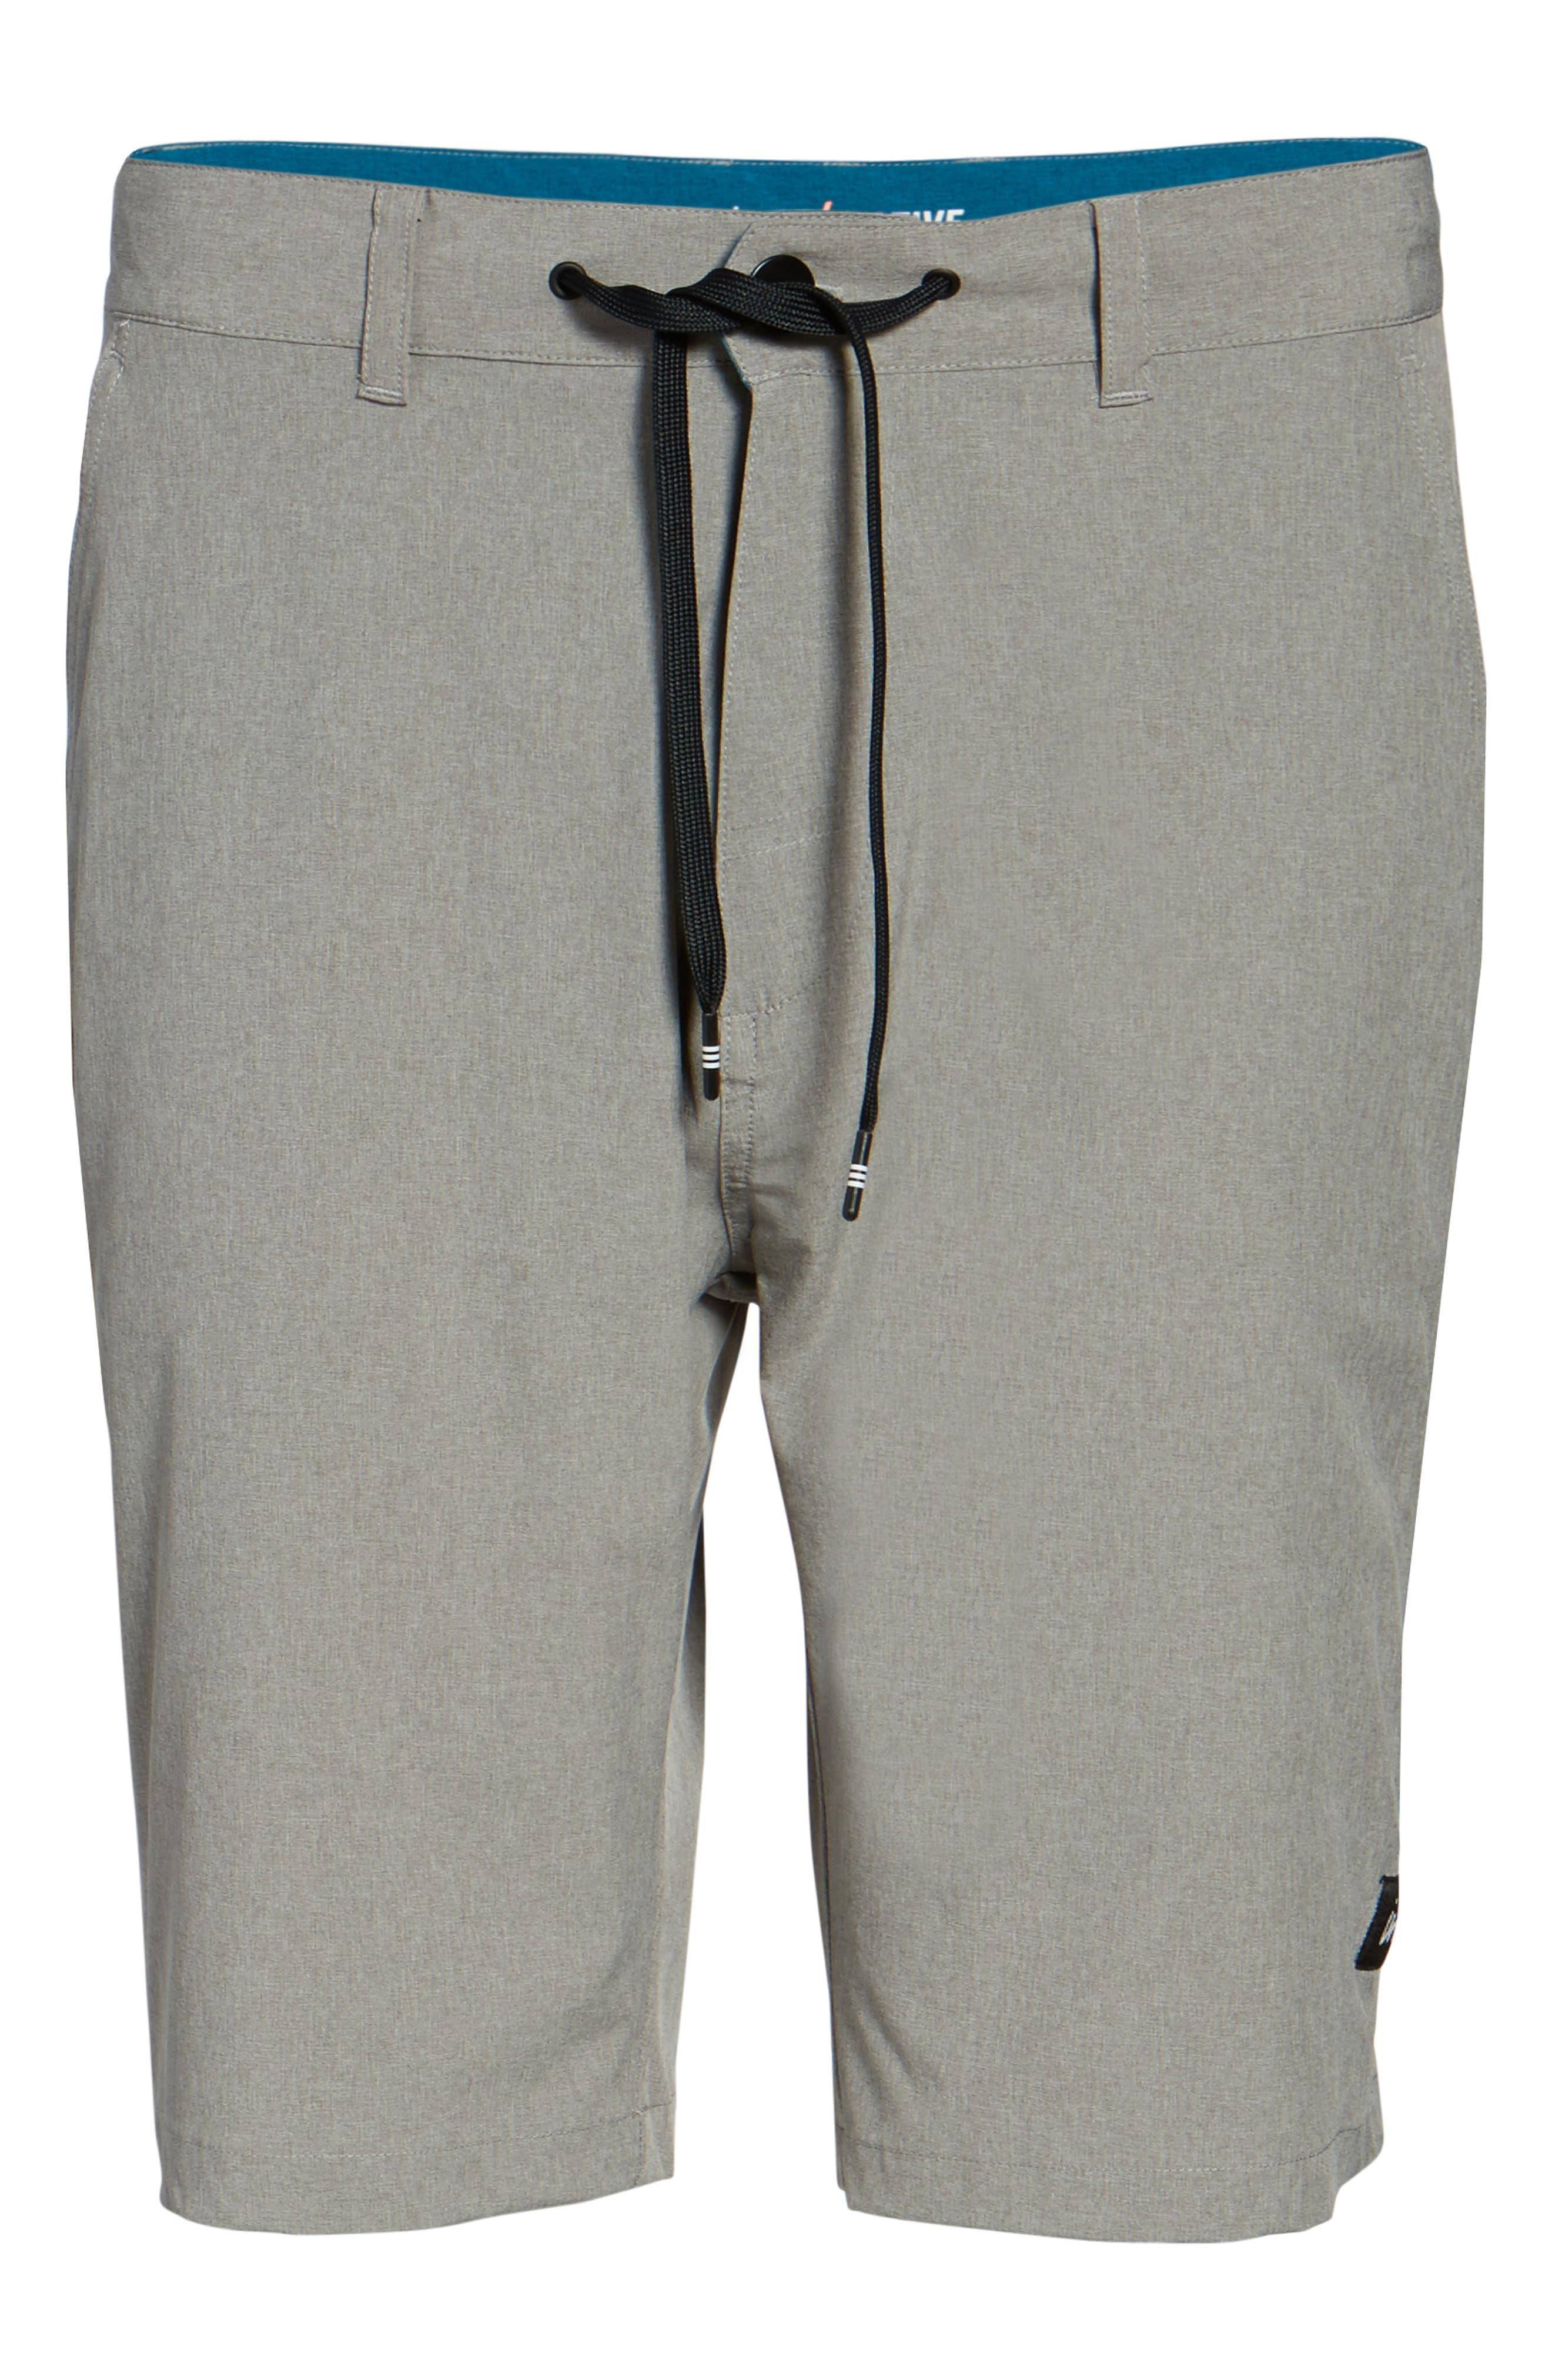 Freedom Carbon Cruiser Shorts,                             Alternate thumbnail 5, color,                             Grey